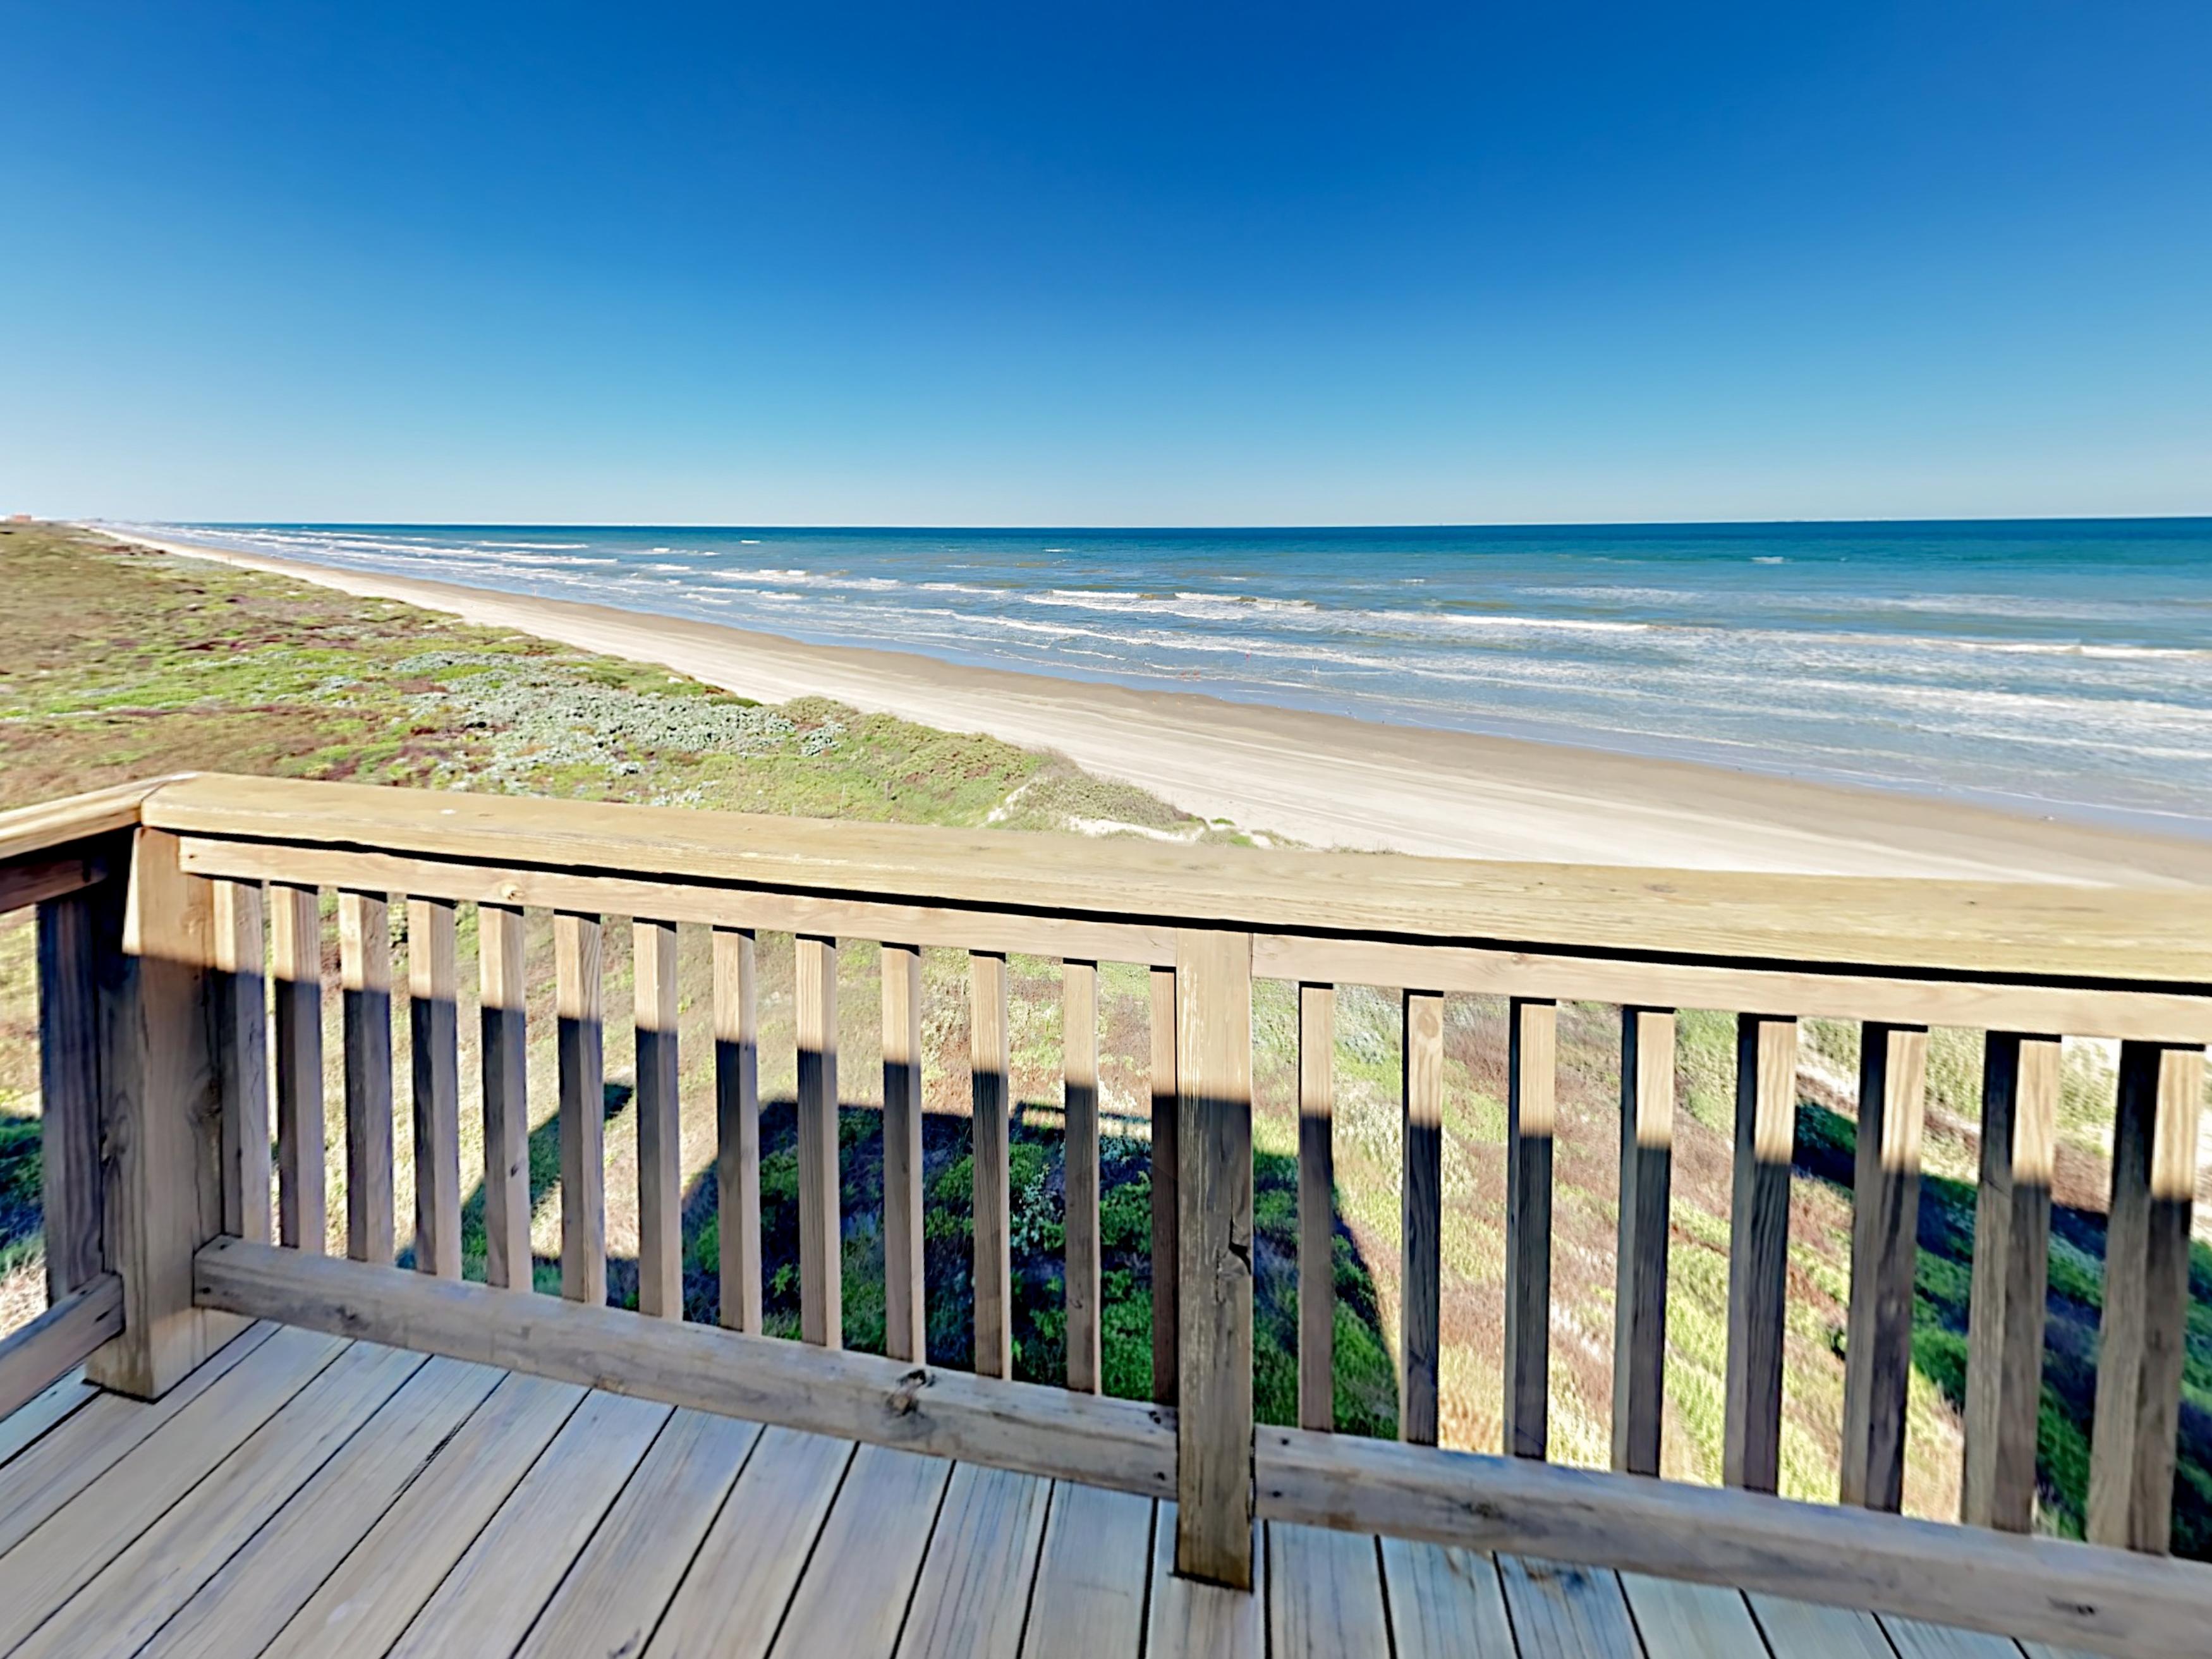 Port Aransas TX Vacation Rental Your beachfront home